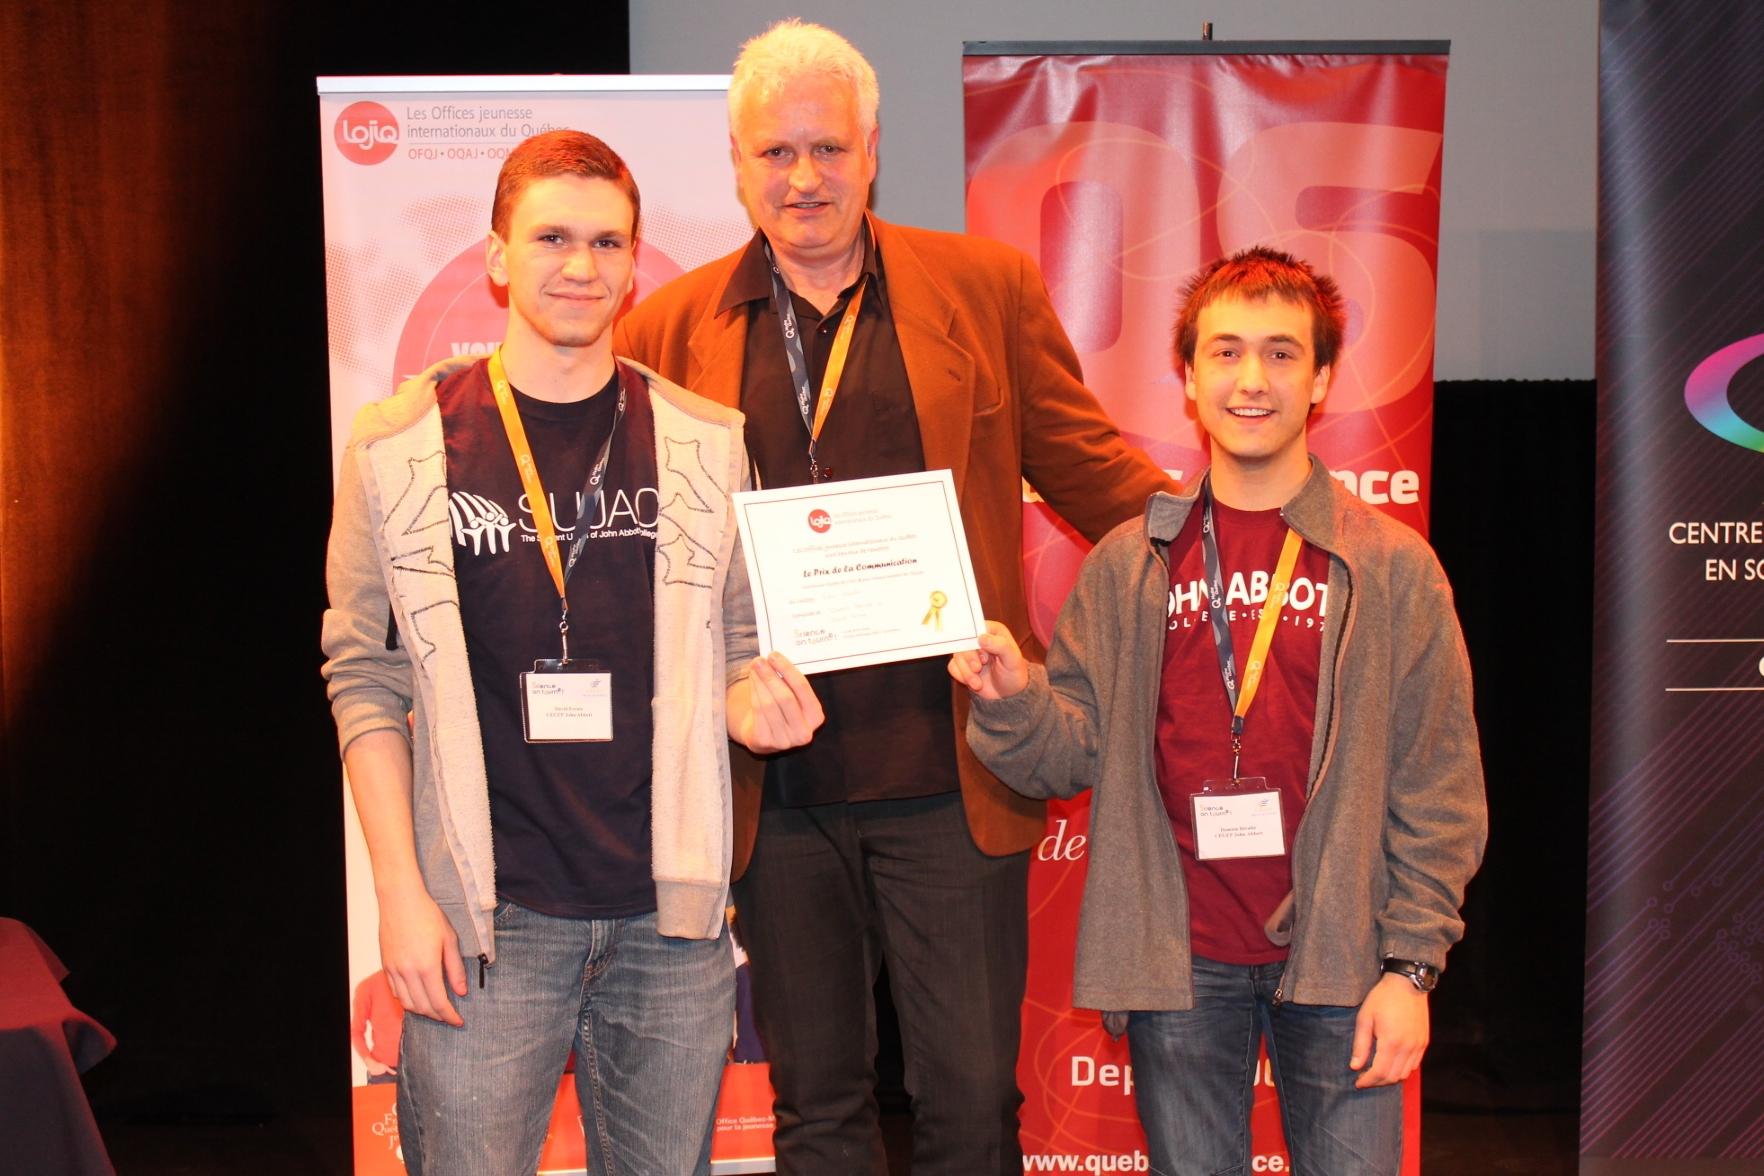 College John Abbott - Prix communication